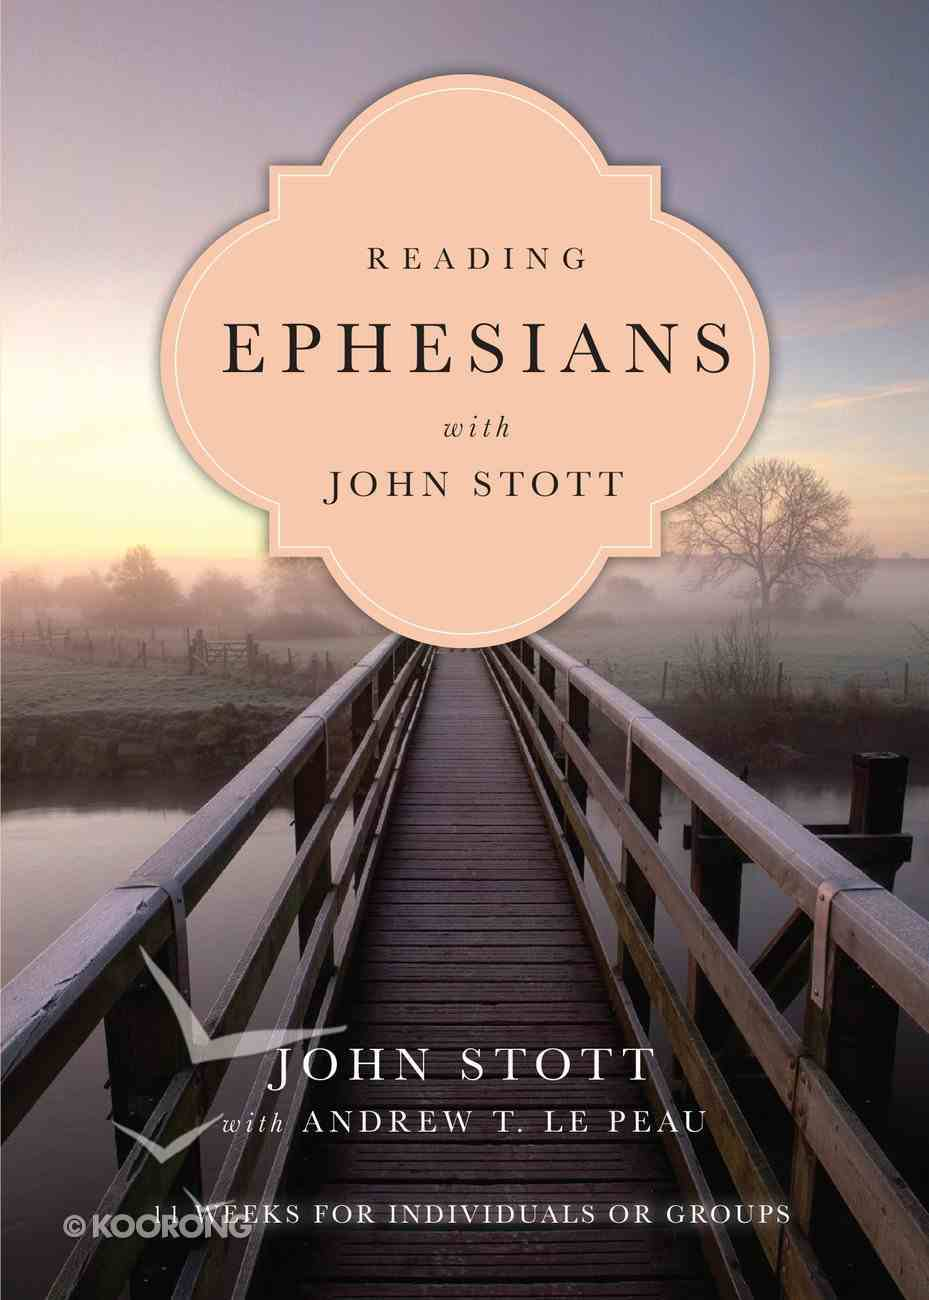 Reading Ephesians With John Stott (Reading The Bible With John Stott Series) eBook